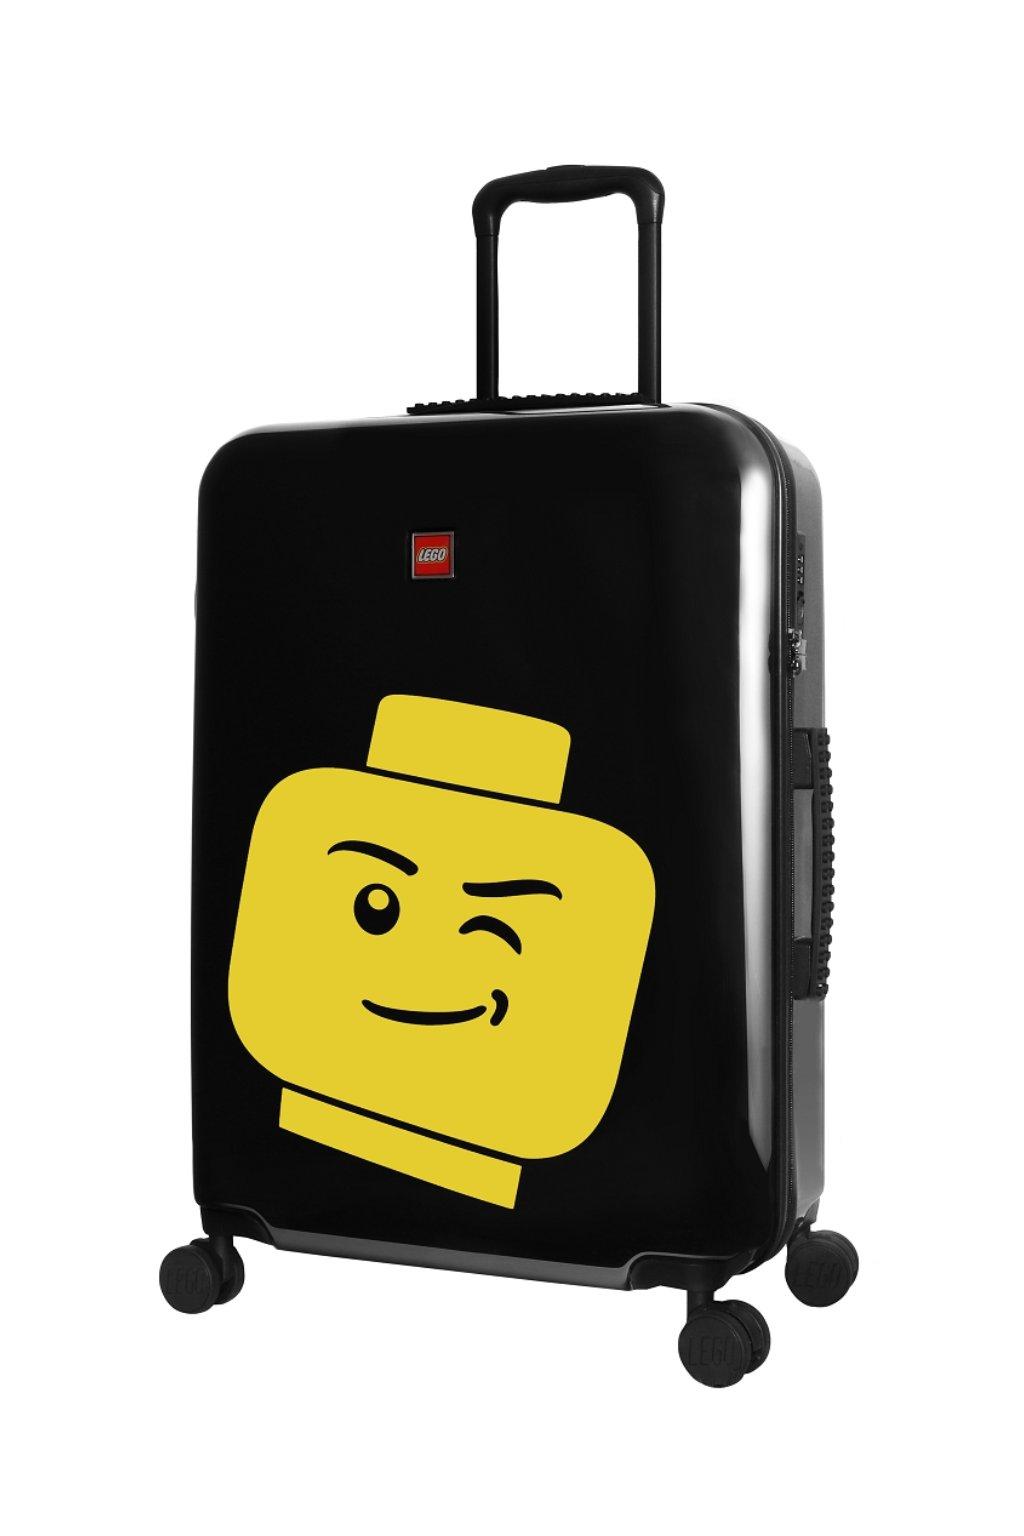 kufrland lego colourbox minifigurehead black1